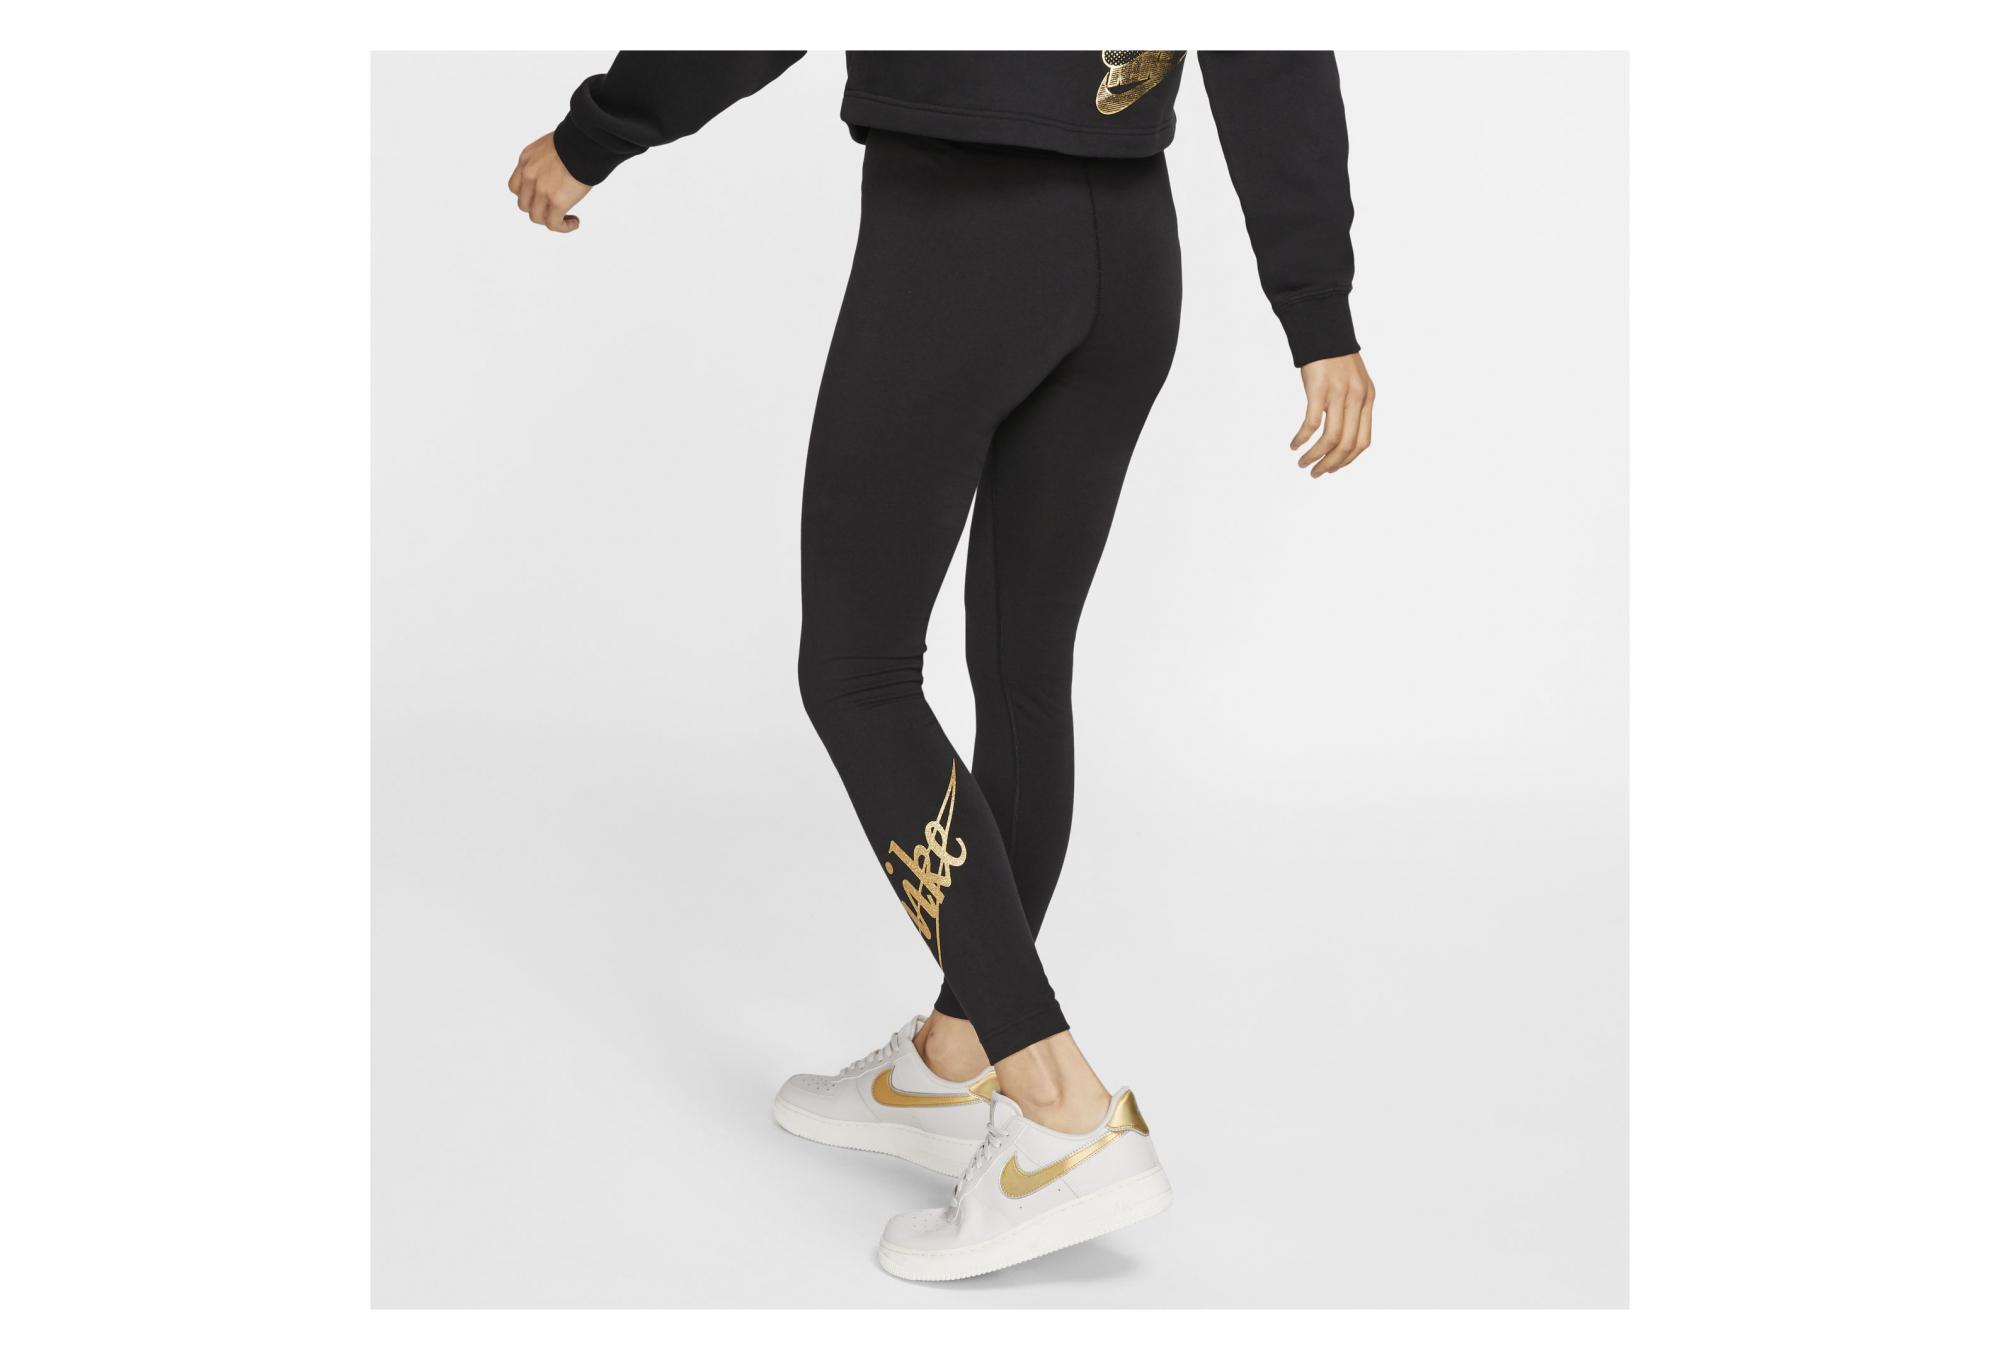 Perú Usando una computadora Oso polar  Legging Femme Nike Sportswear Noir | Alltricks.fr